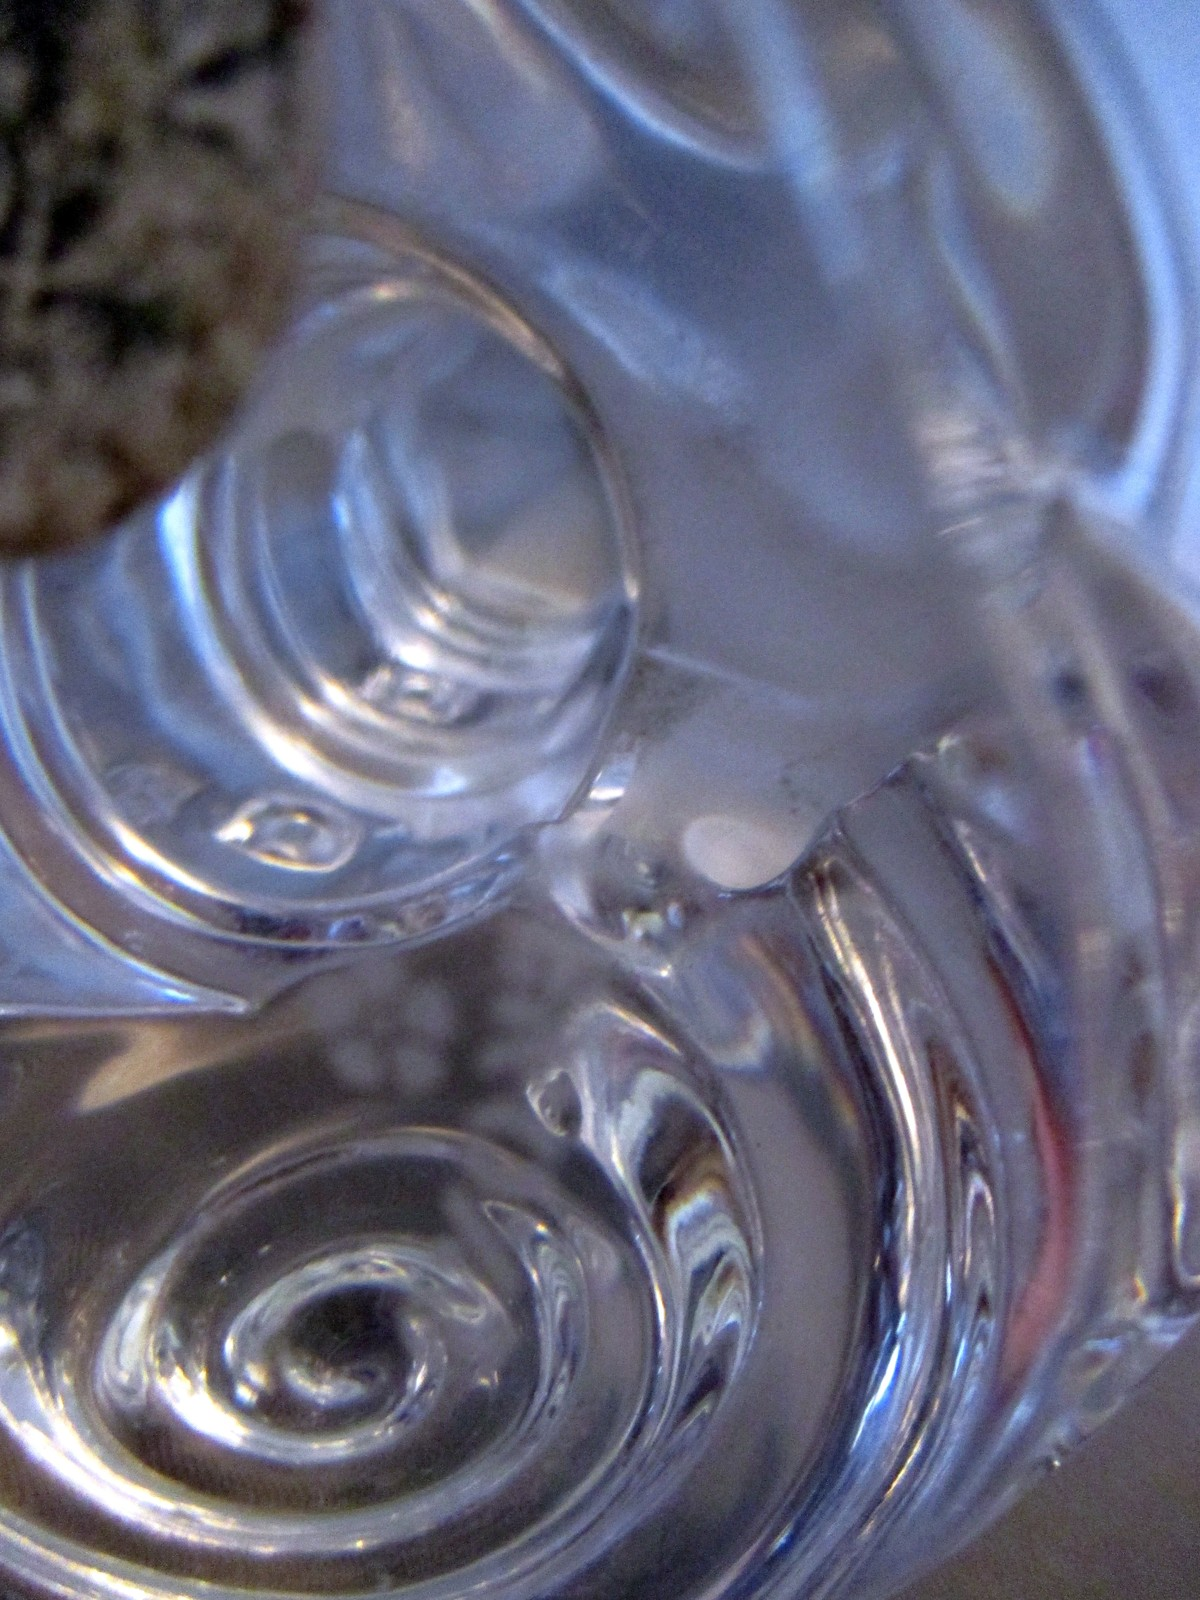 LENOX CRYSTAL LIGHTHOUSE VOTIV E CANDLE HOLDER MADE IN CZECH REPUBLIC